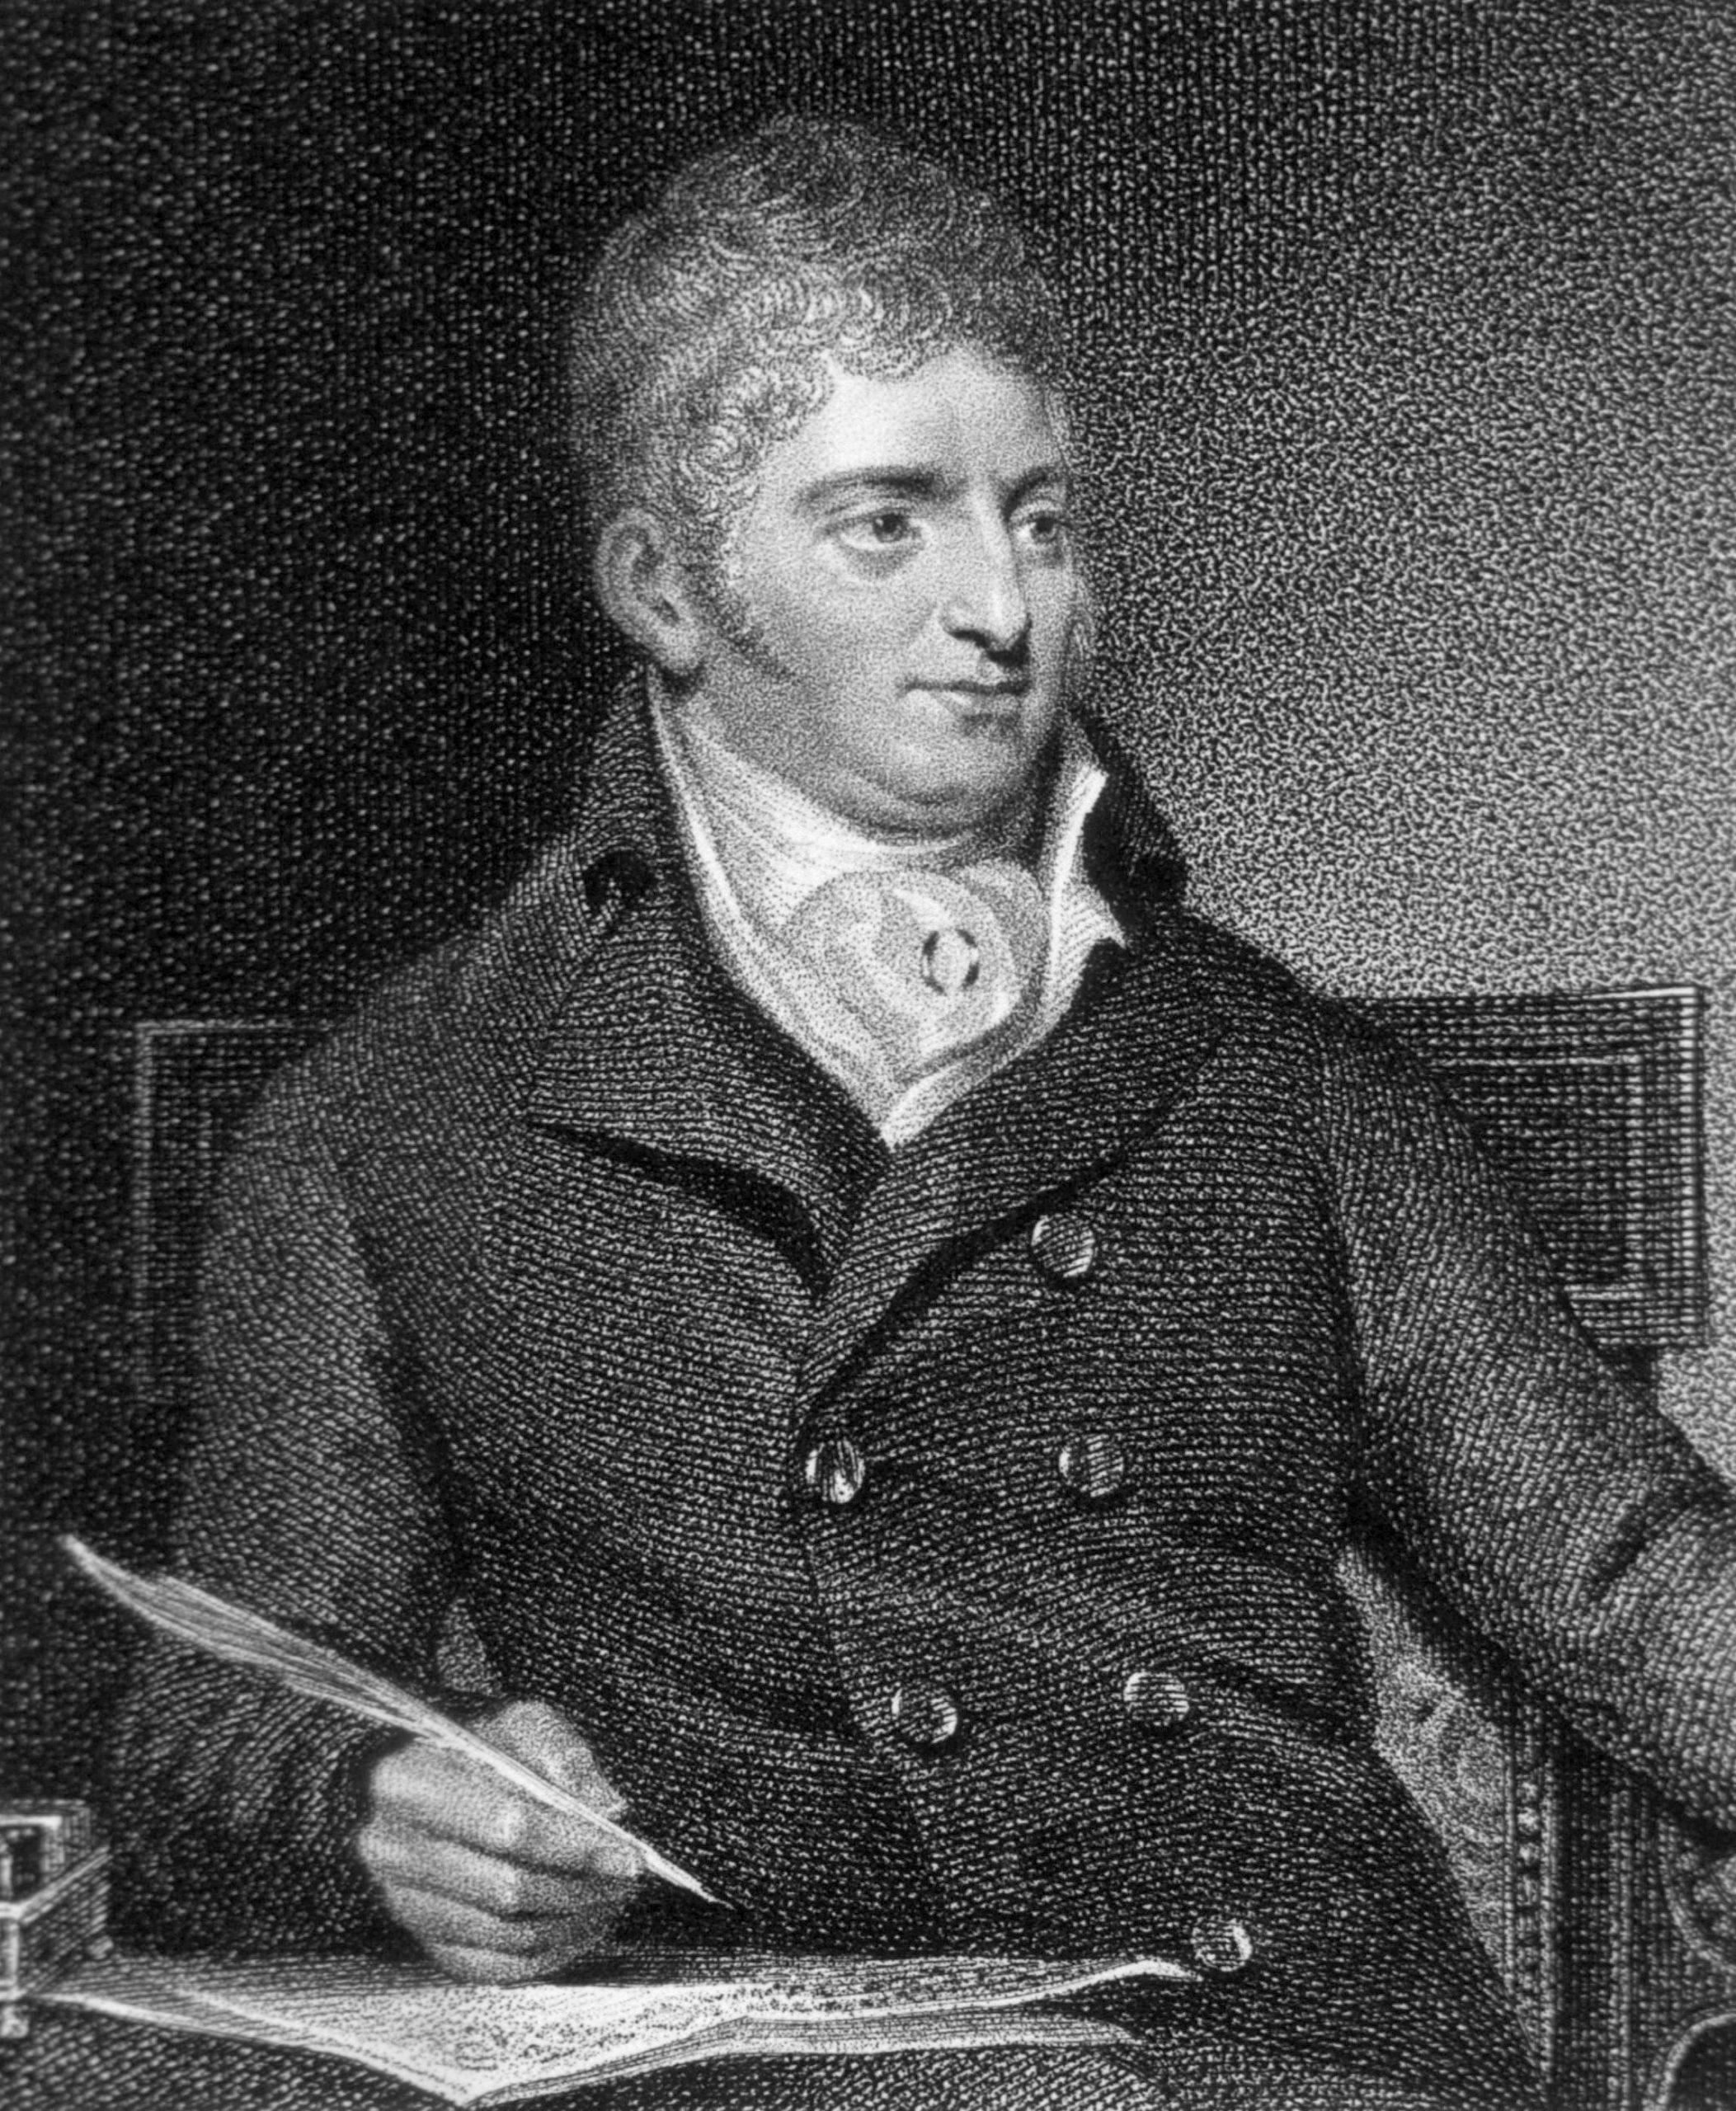 Nathan Drake (essayist)